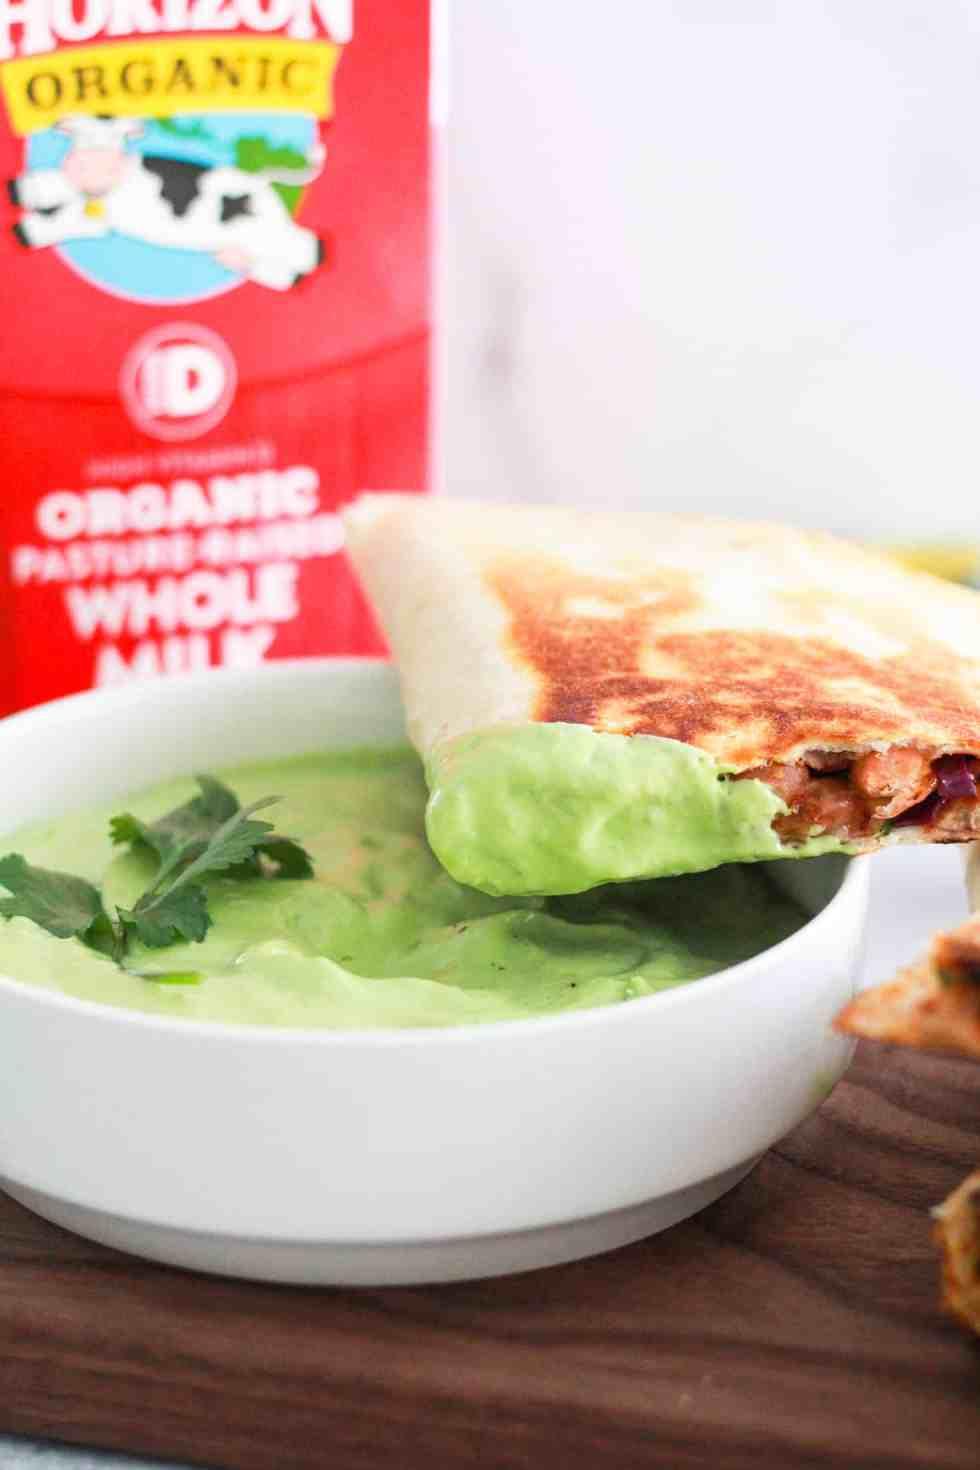 Vegetarian quesadilla dipped in green sauce with carton of Horizon Organic milk behind it.